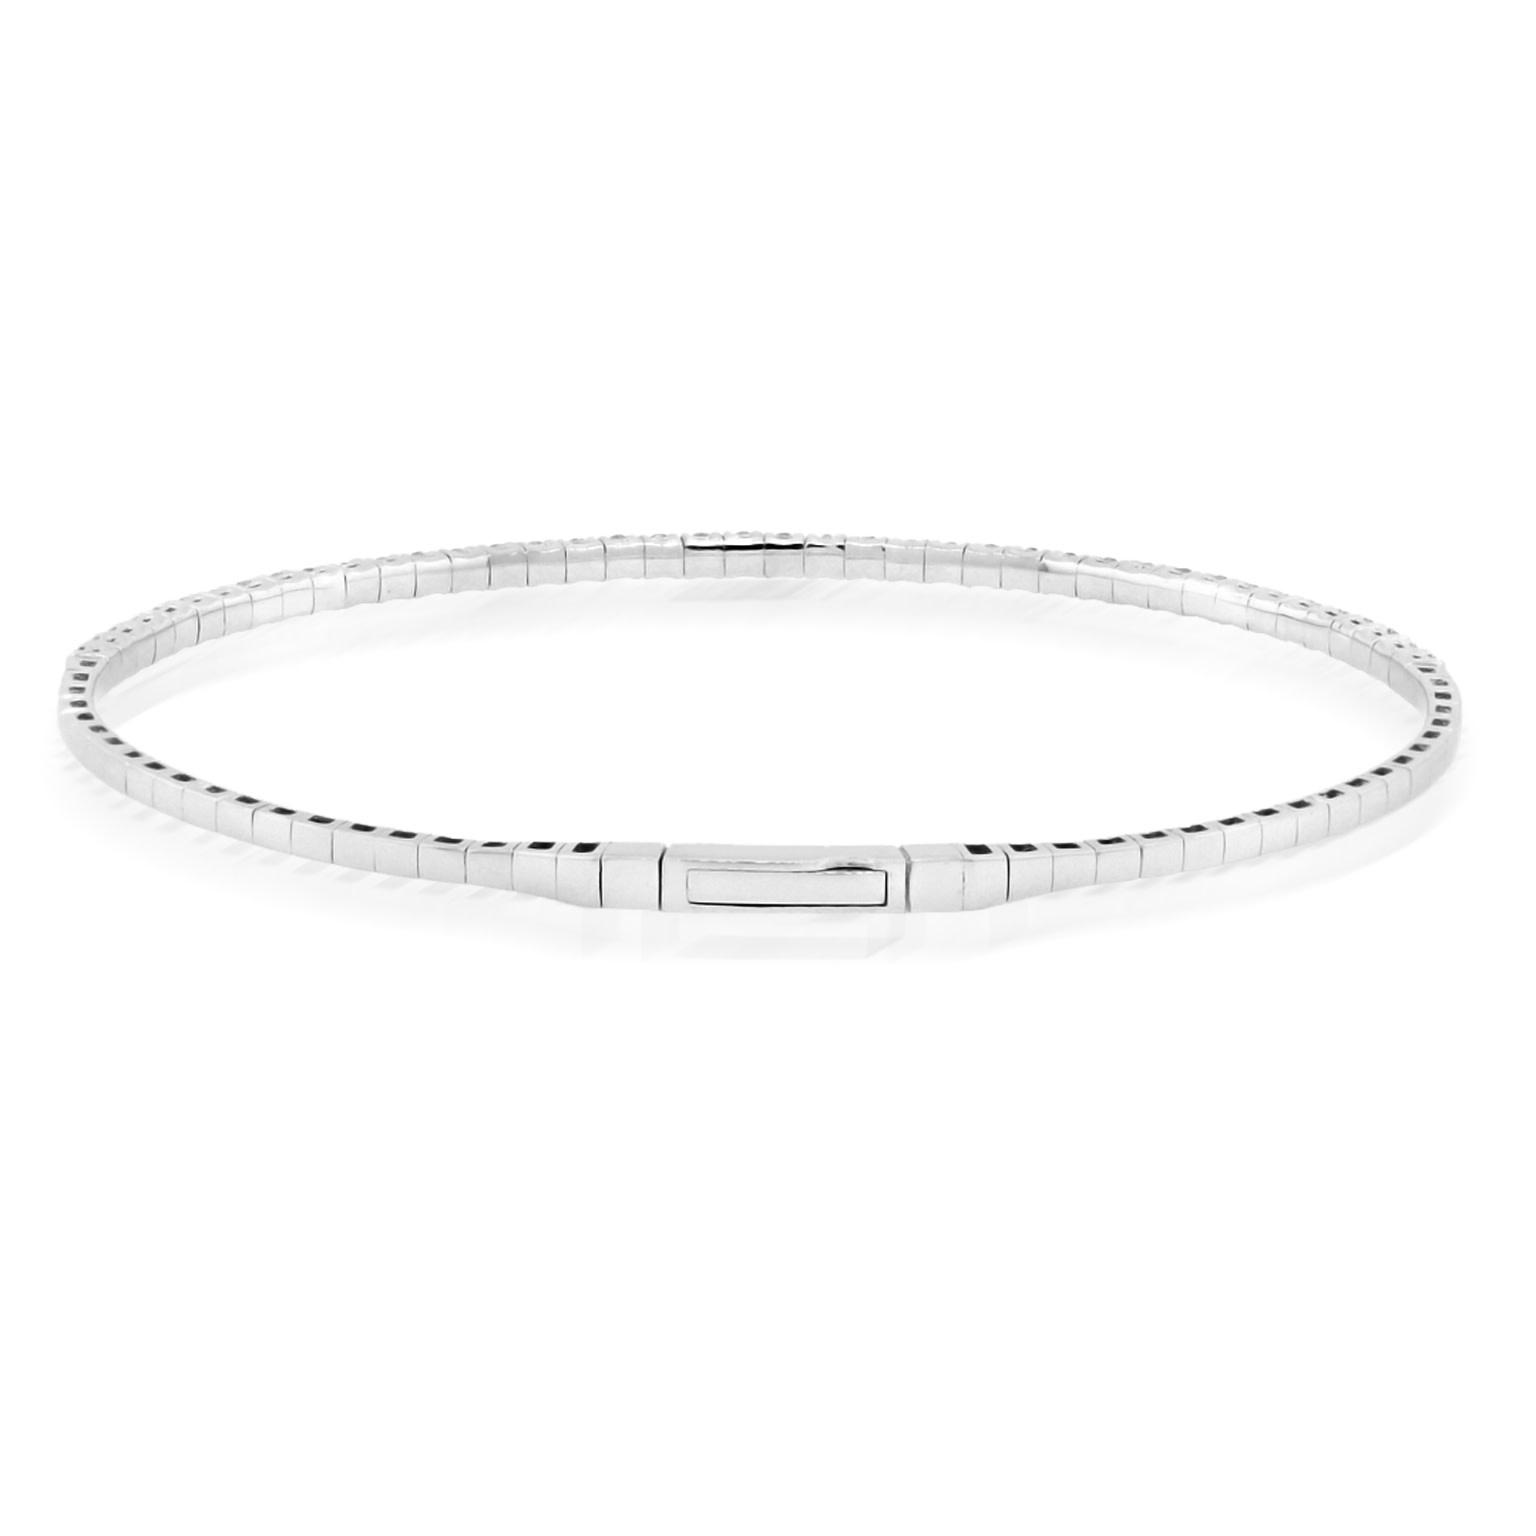 Trabert Goldsmiths 1ct White Gold Diamond Flex Bracelet